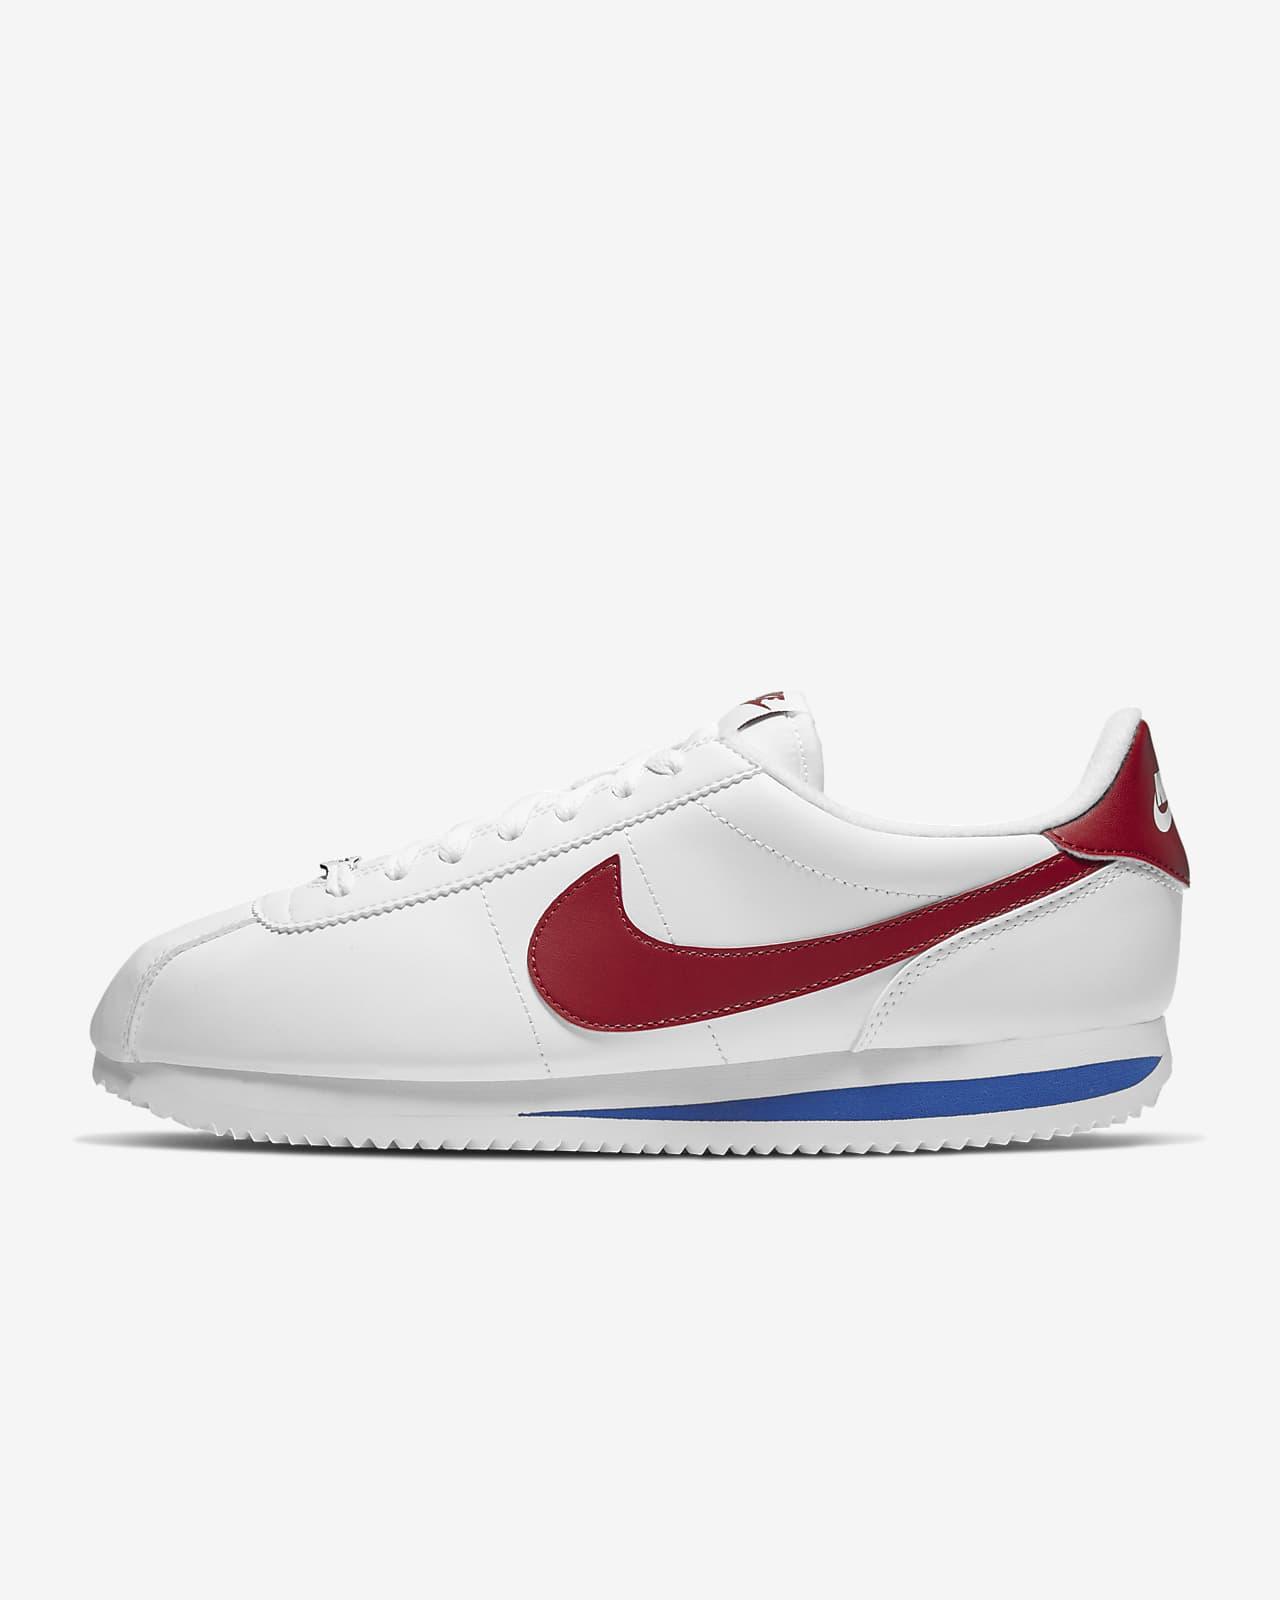 esponja medio Industrializar  Nike Cortez Basic Shoe. Nike LU